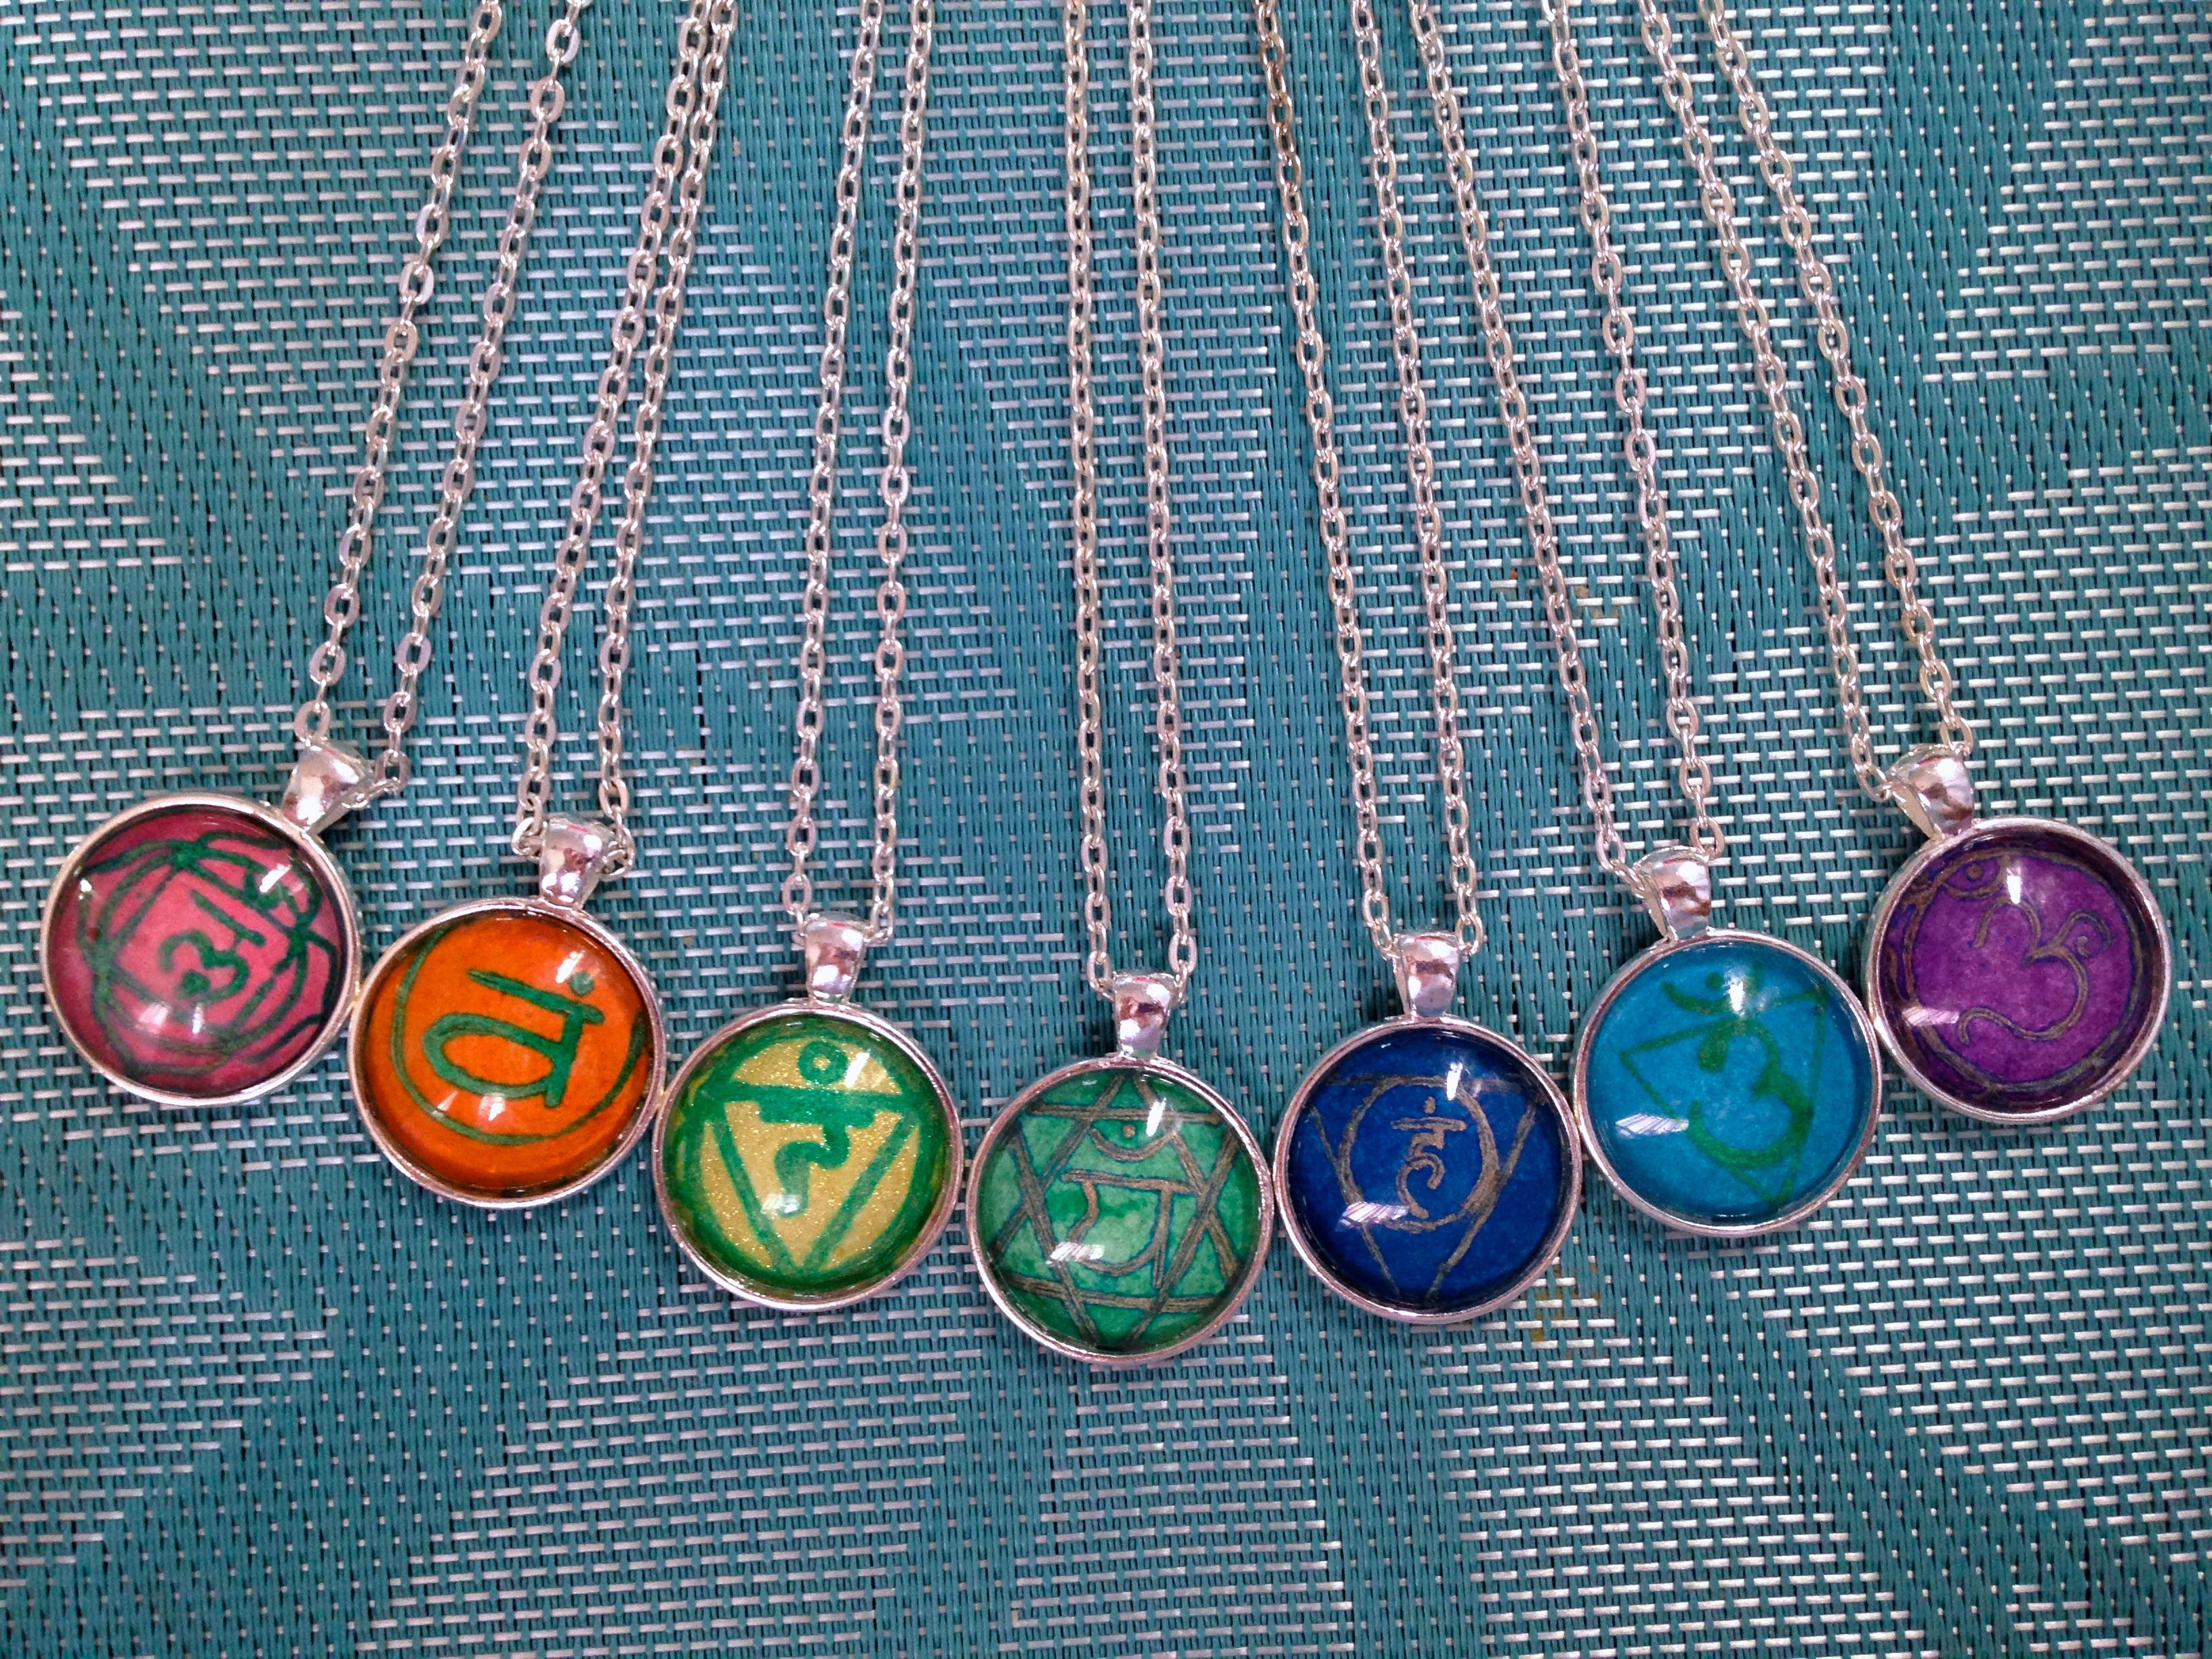 Chakra-all-chain